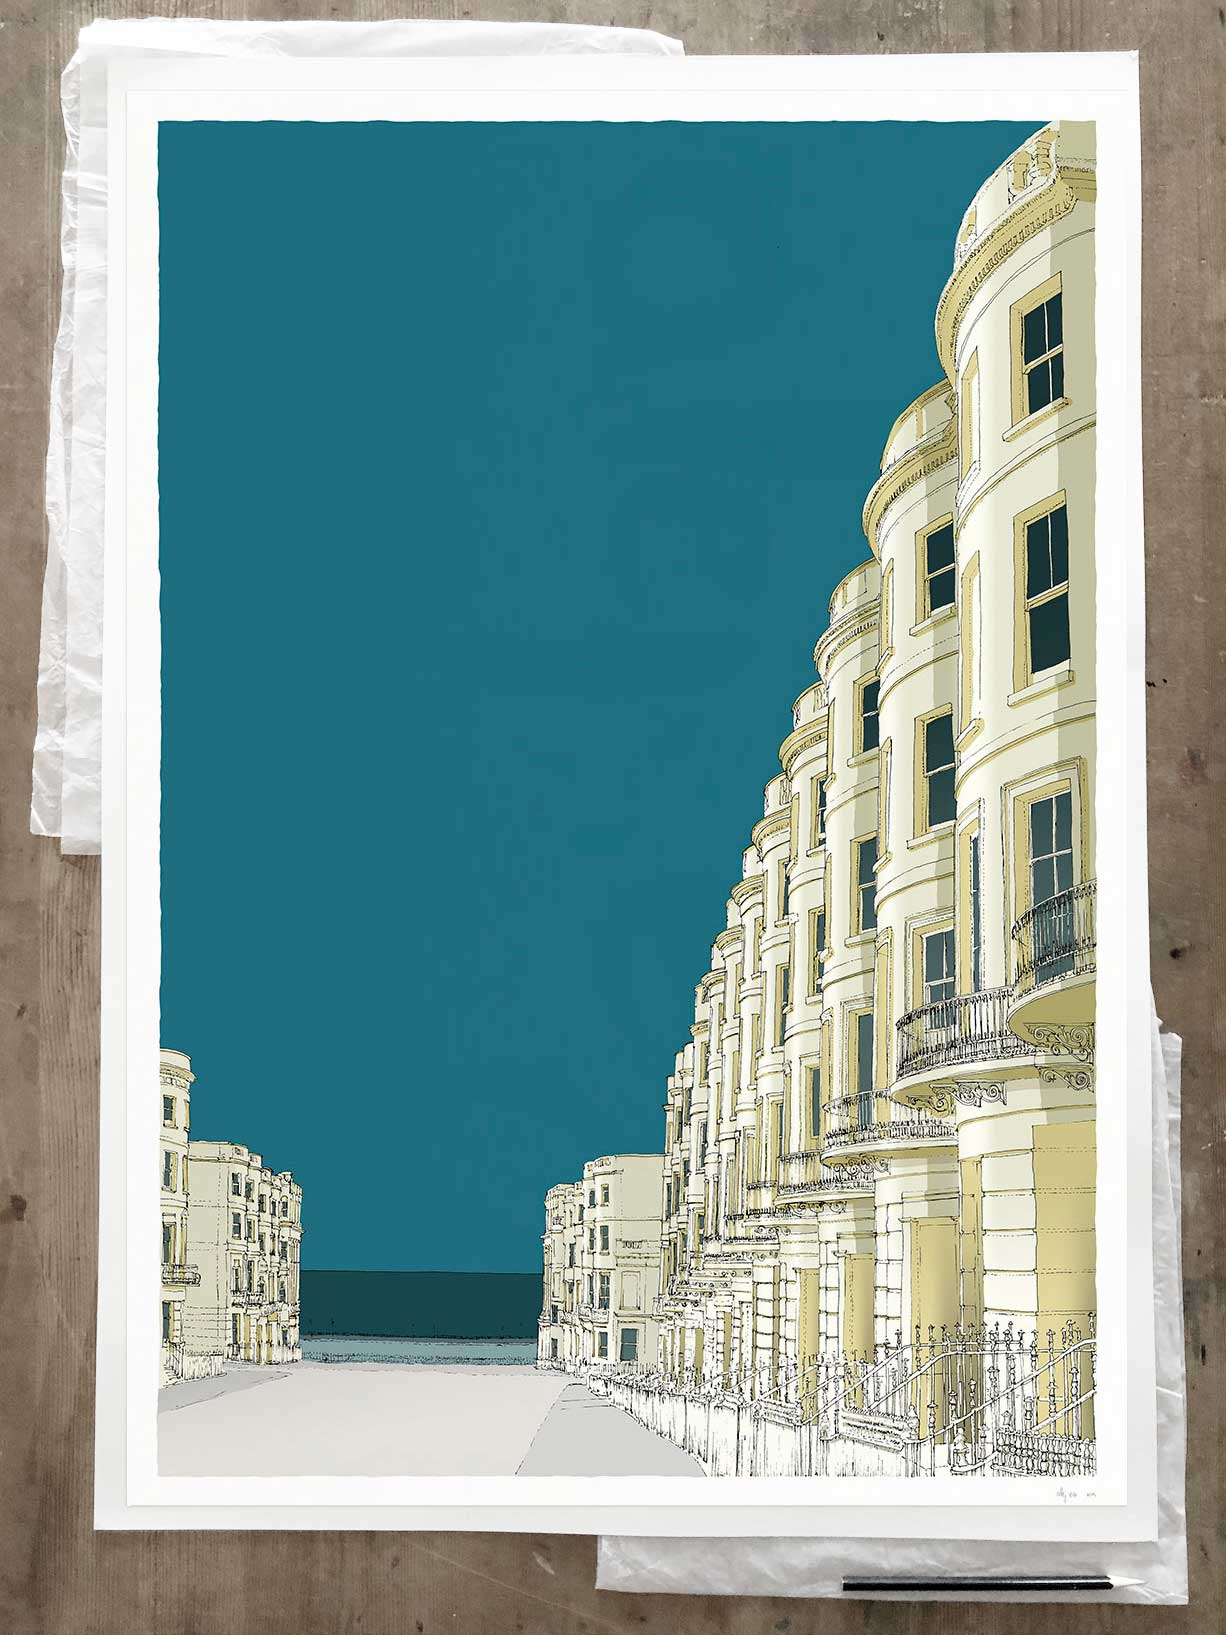 Fine art print by artist alej ez titled Brunswick Place and the Sea